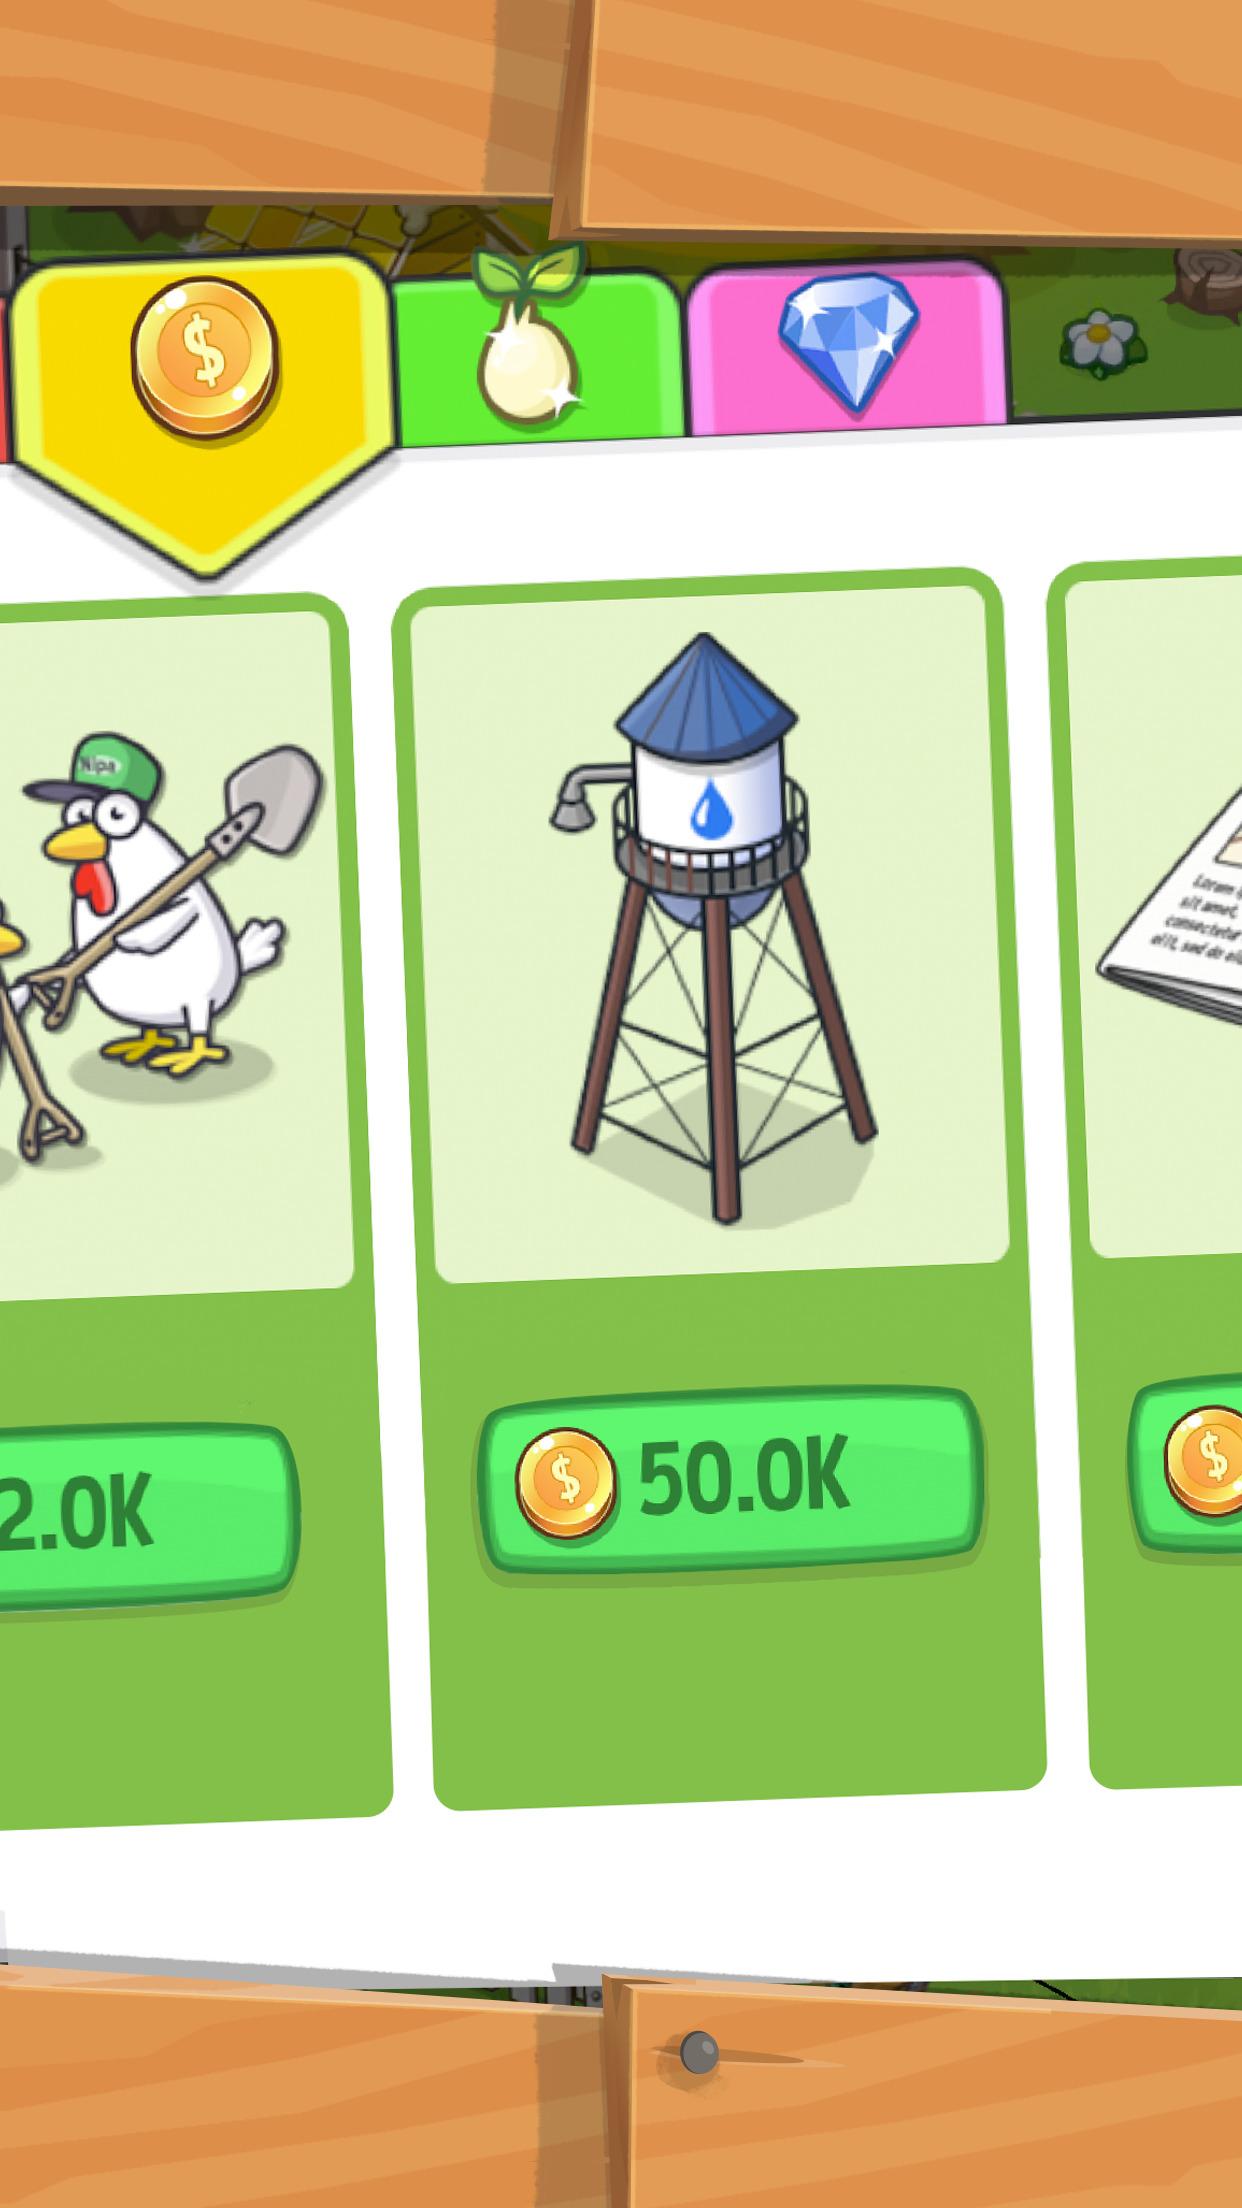 Farm Away! - Idle Farming Game Screenshot